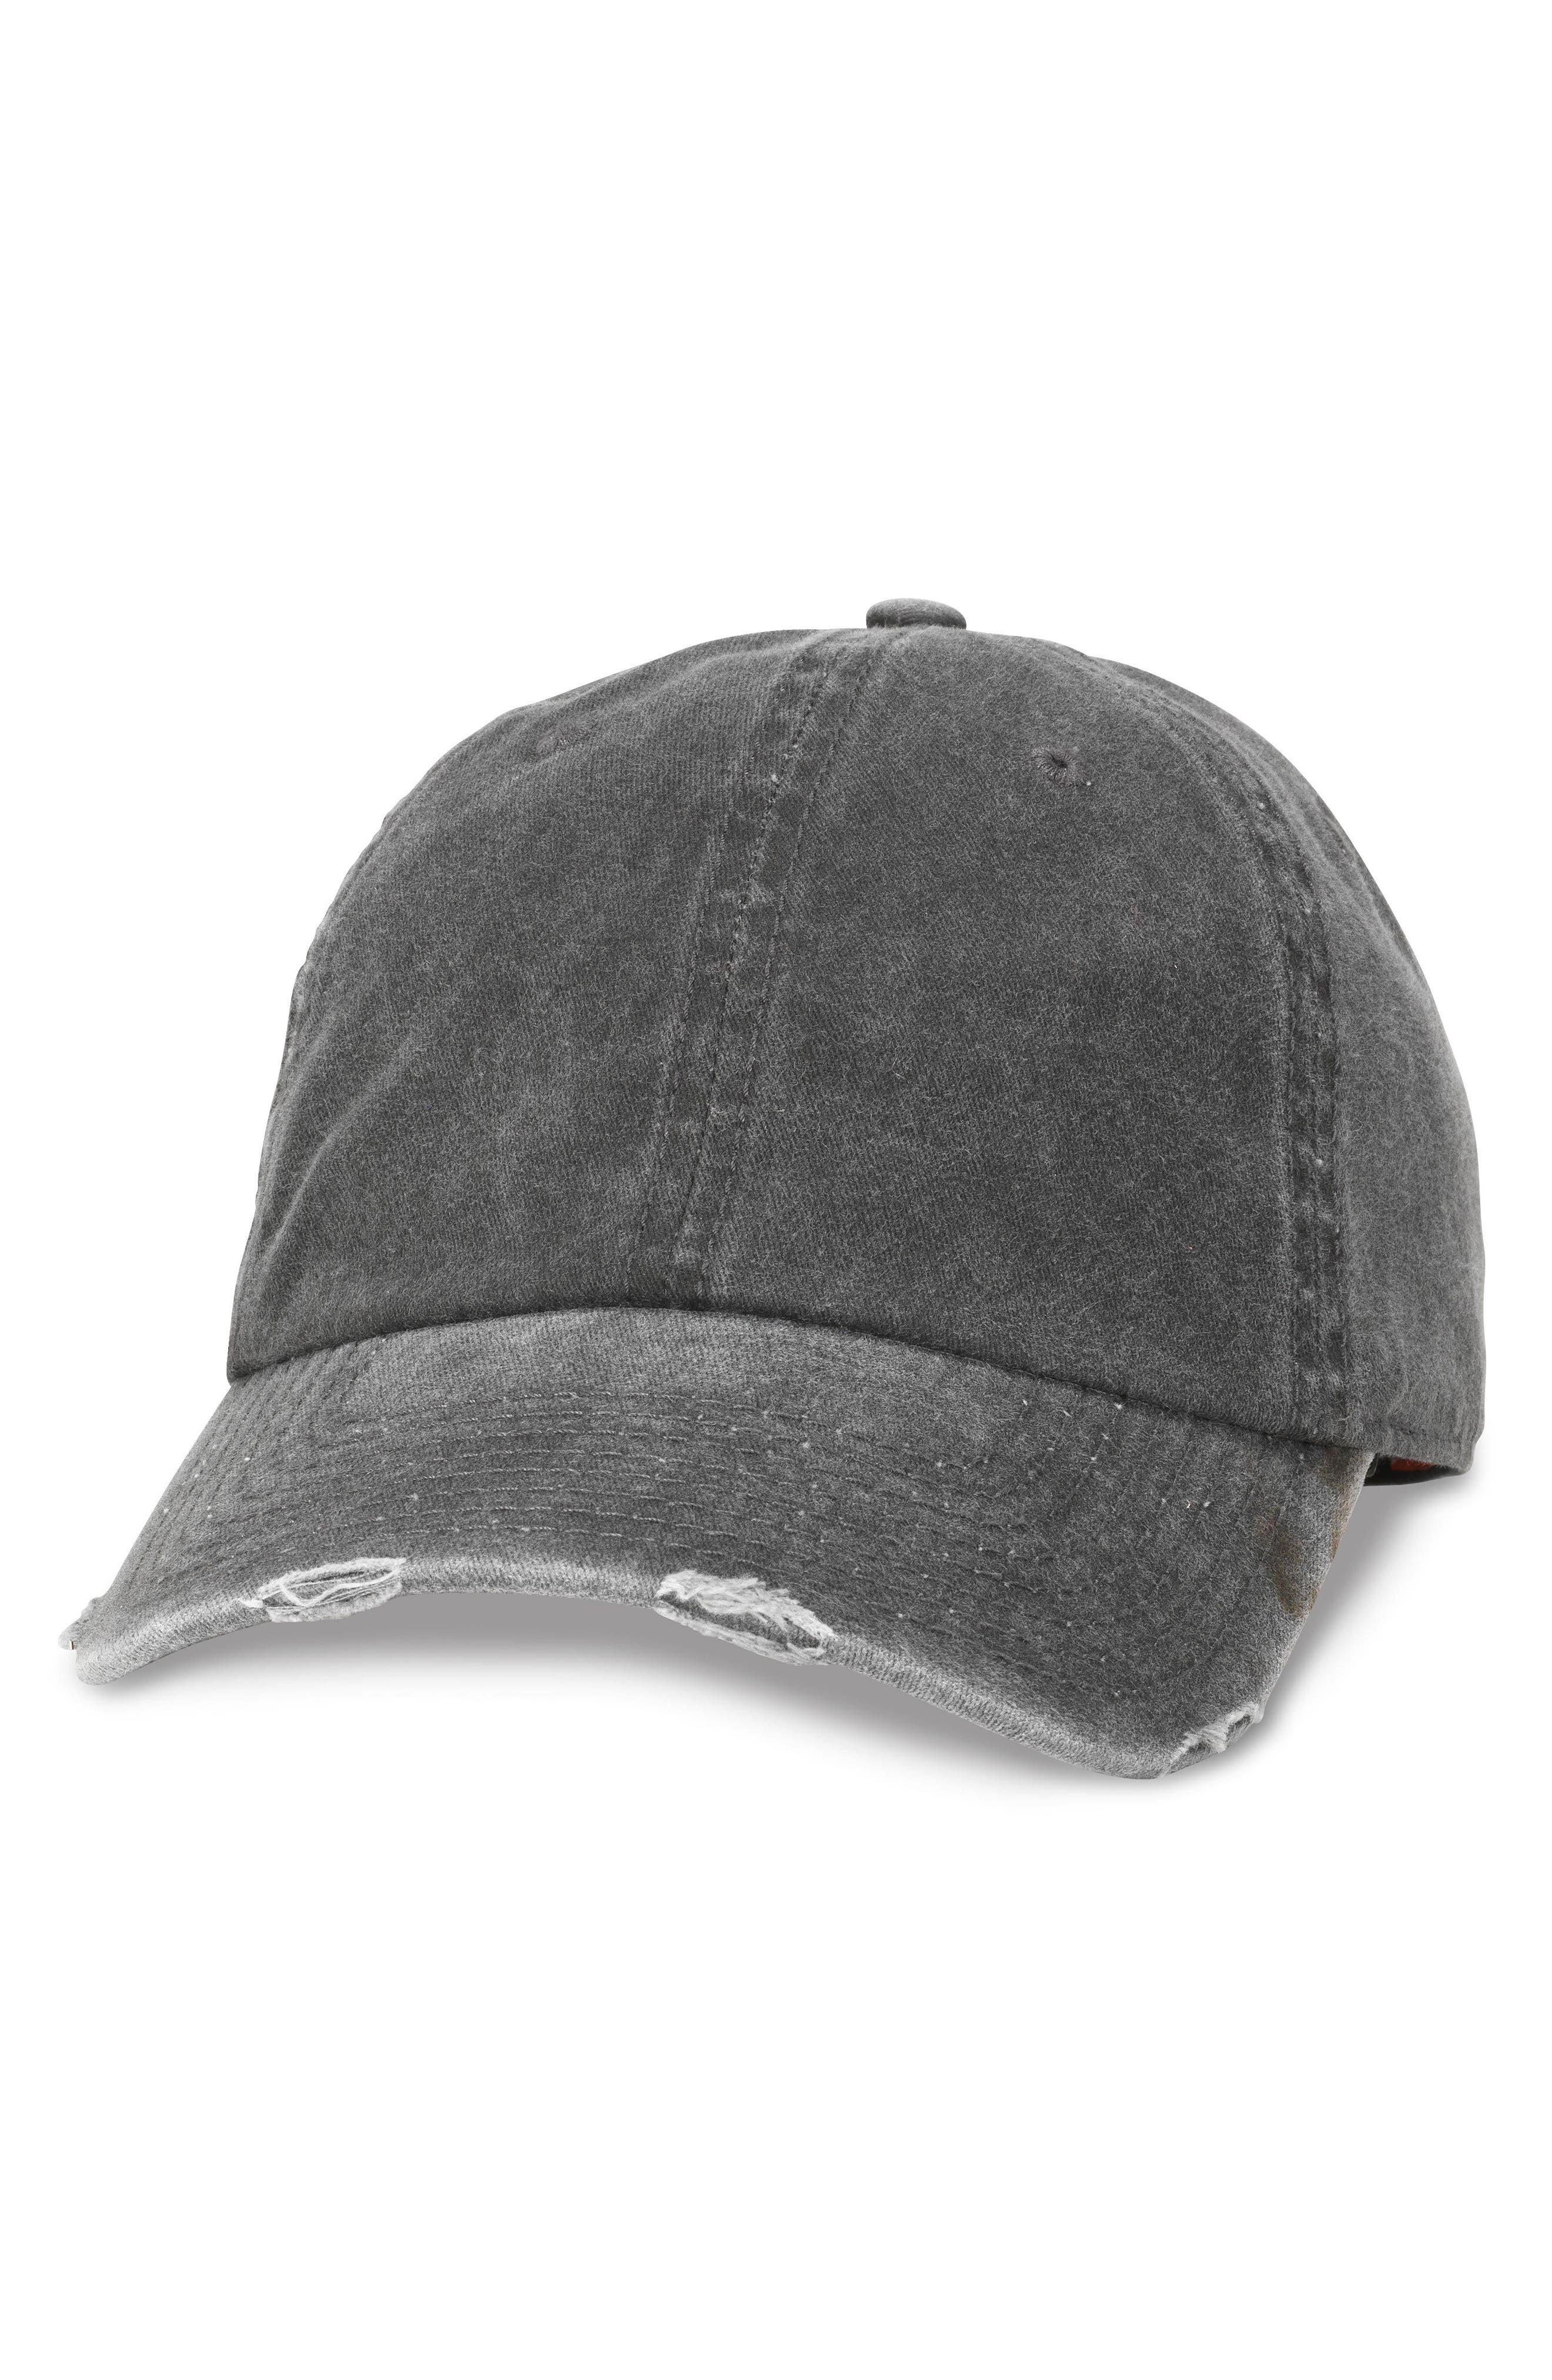 Raglan Legacy Ball Cap,                         Main,                         color, 001